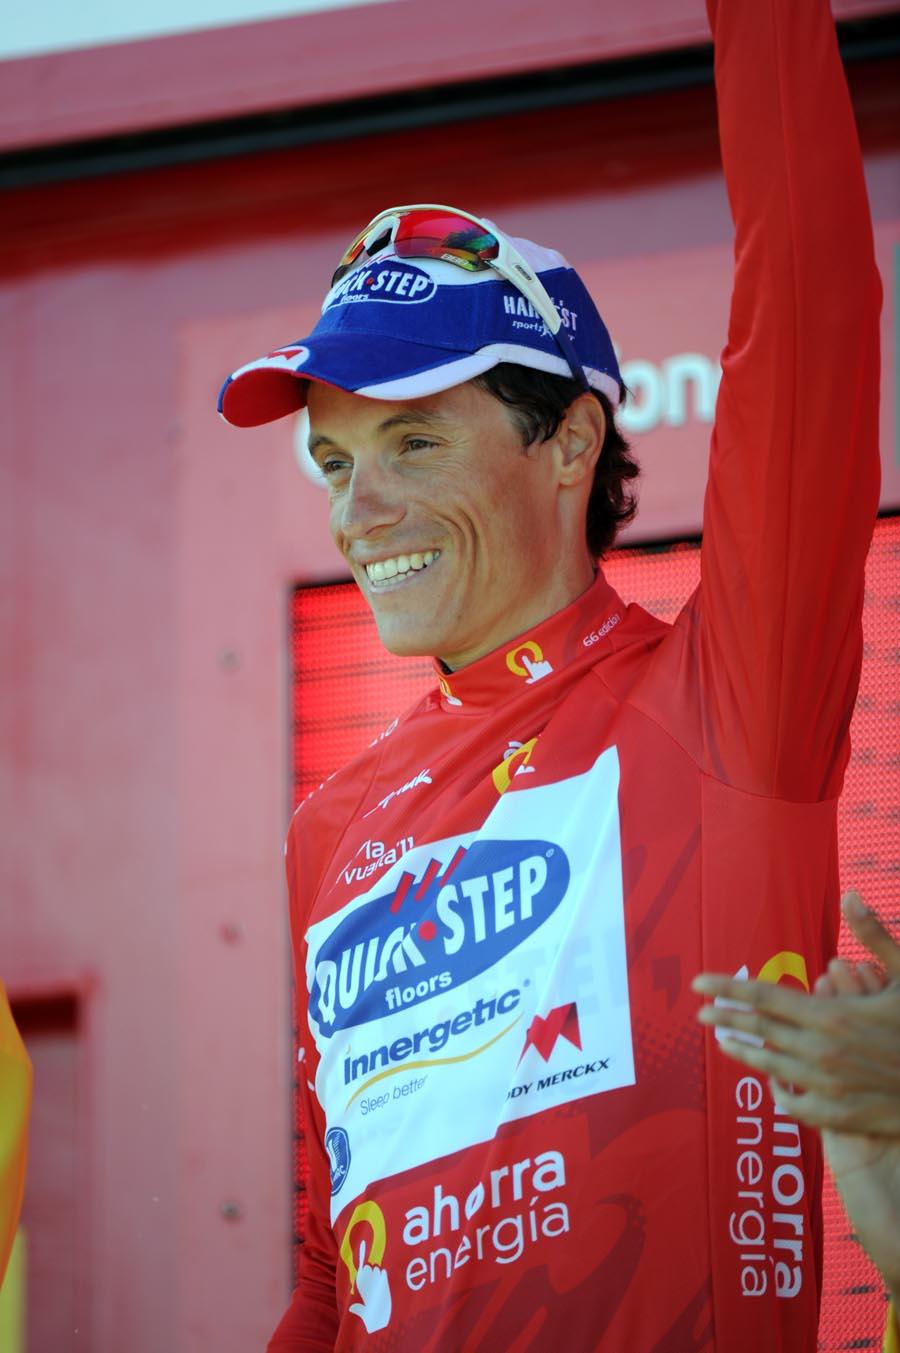 Sylvain Chavanel on podium, Vuelta a Espana 2011, stage seven